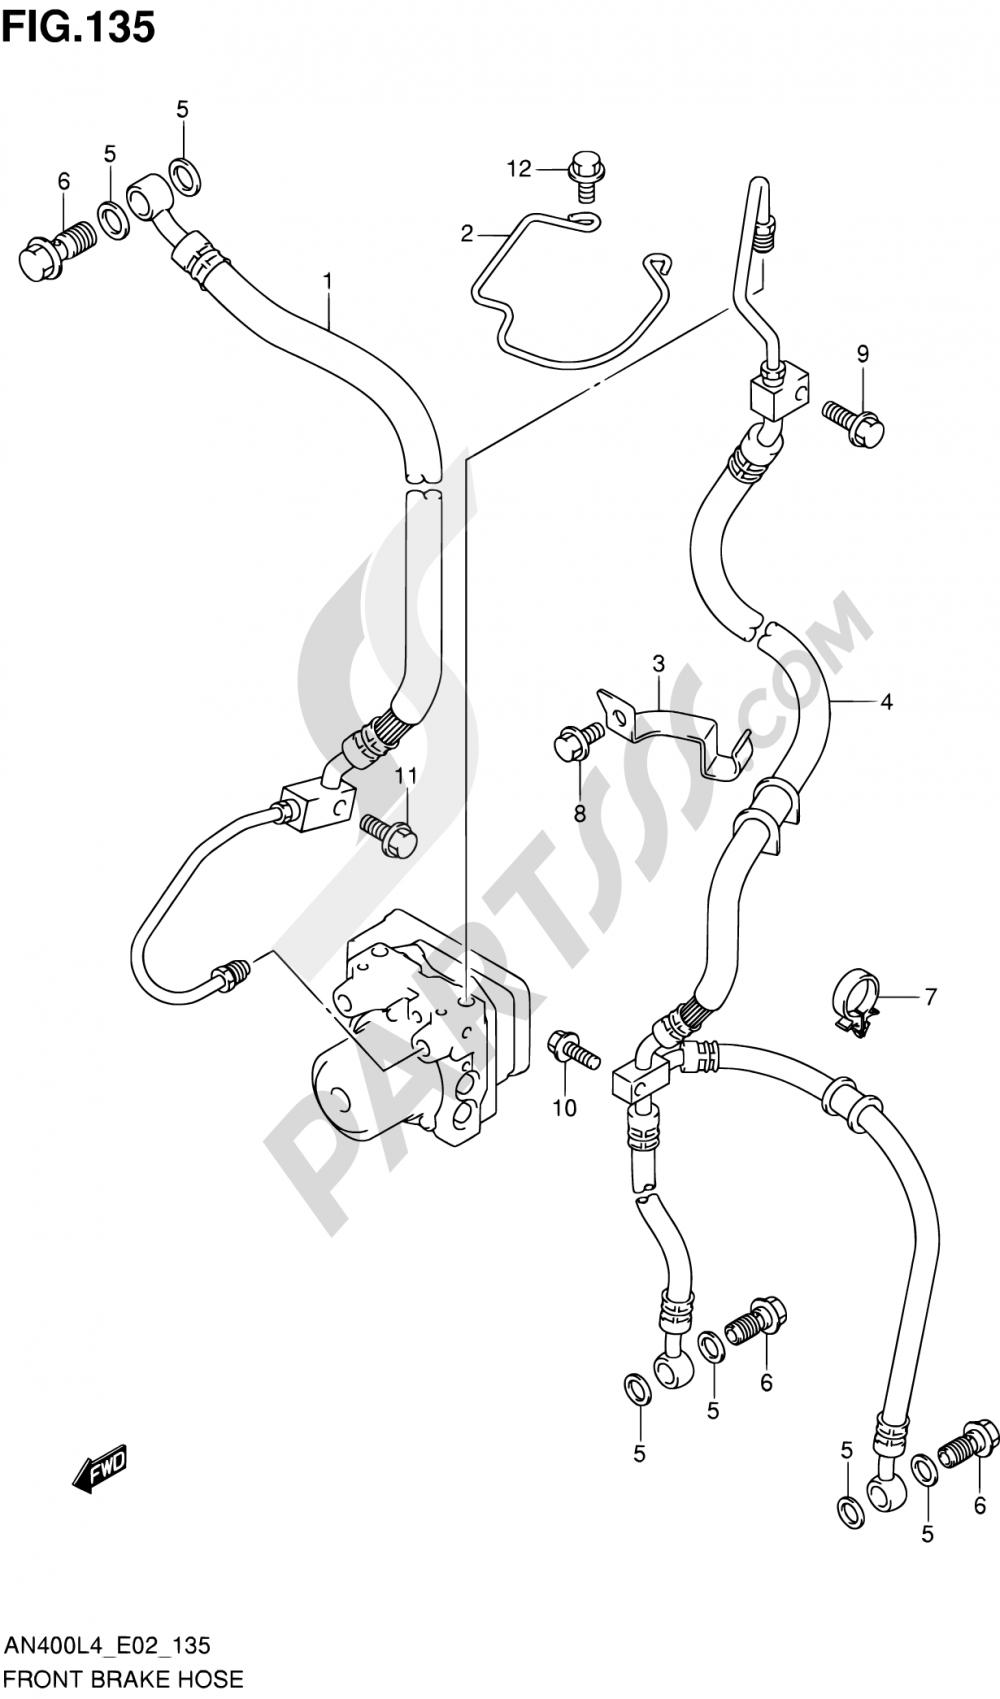 135 - FRONT BRAKE HOSE (AN400AL4 E02) Suzuki BURGMAN AN400 2014